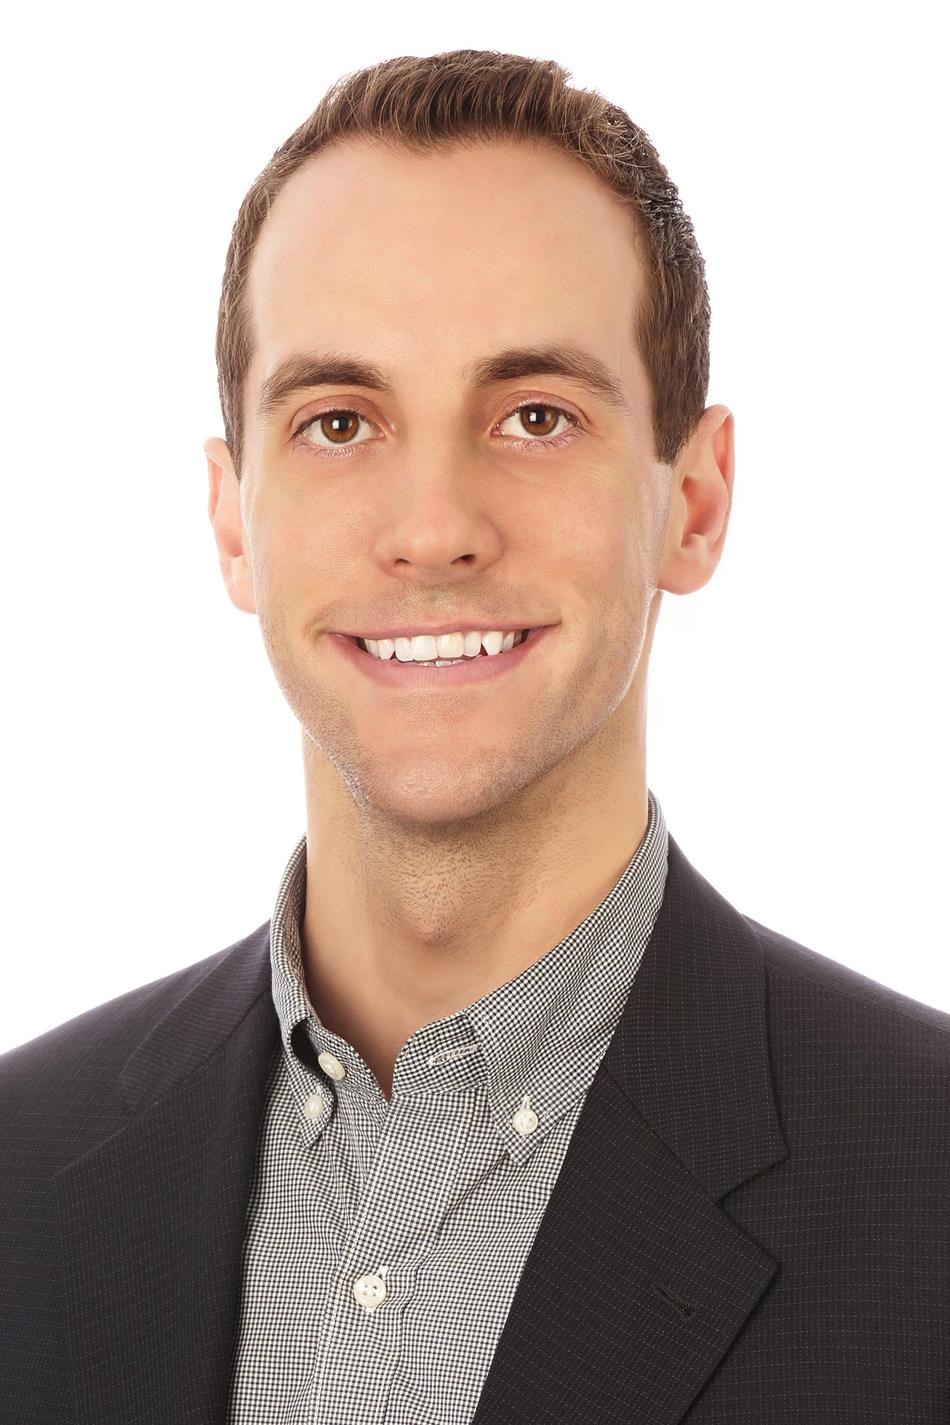 Reid Harris, Director of Business Intelligence at MPI